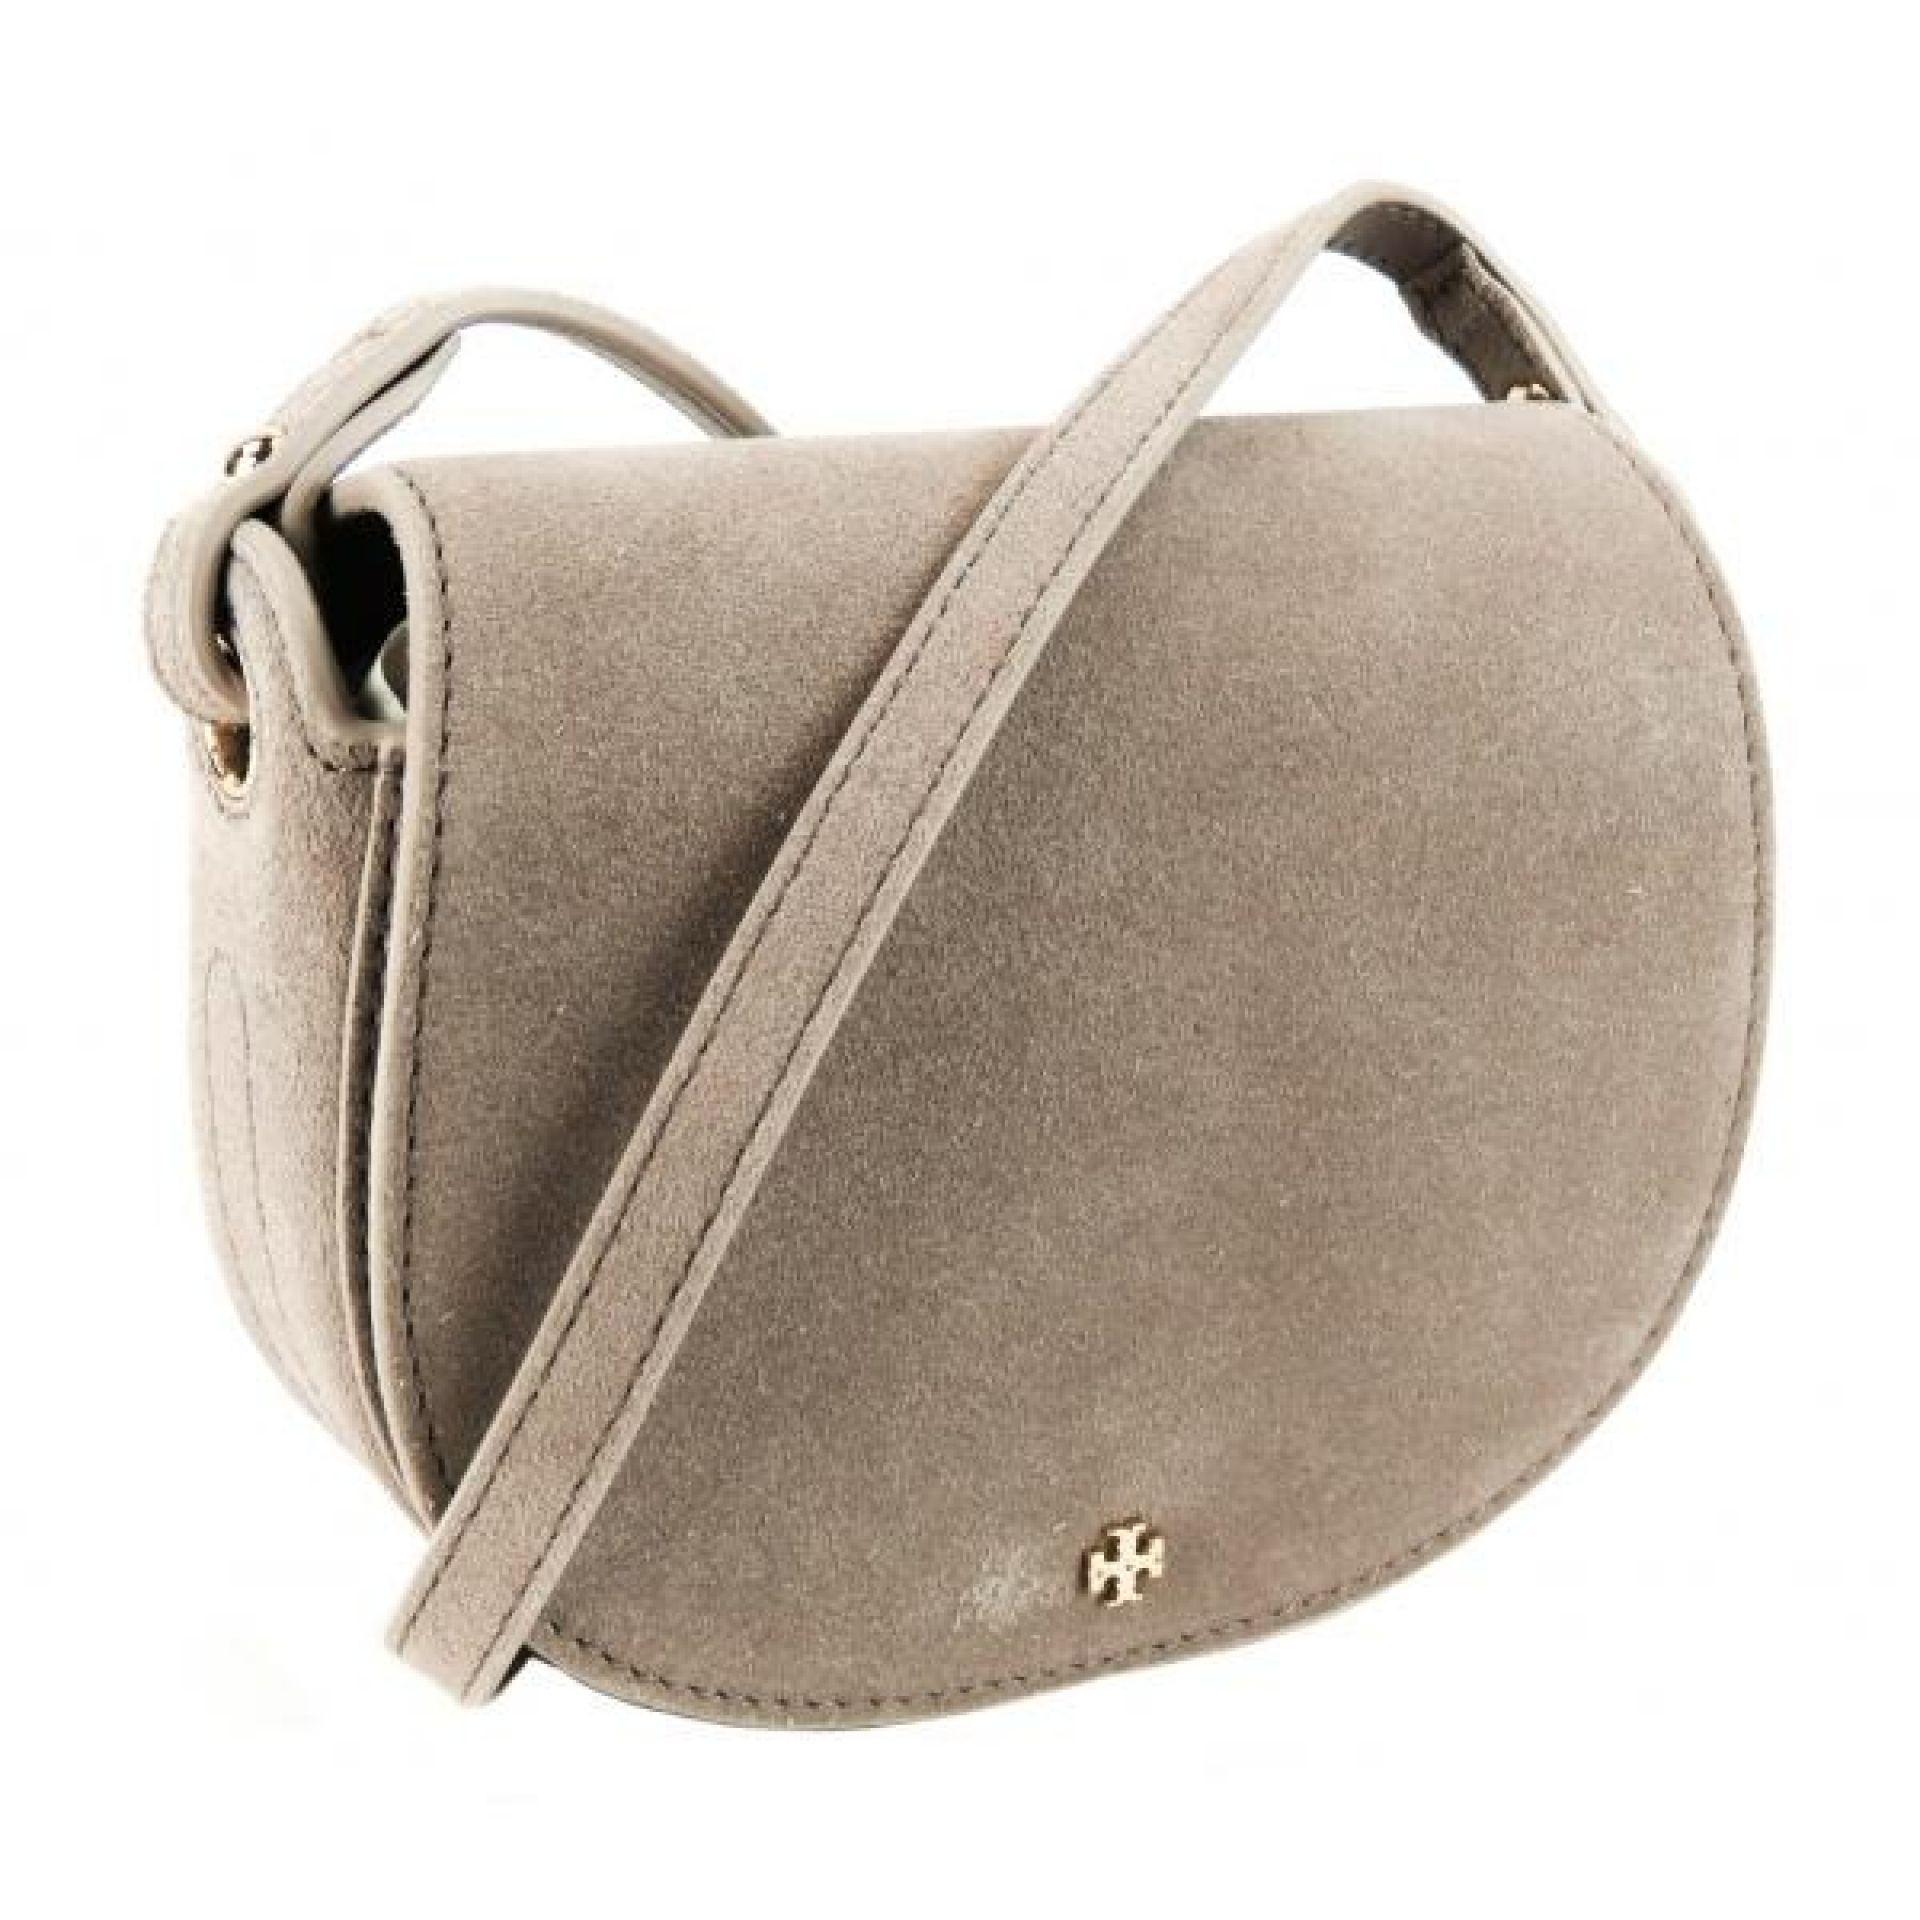 Tory Burch French Gray Suede Mini Saddle Crossbody Bag